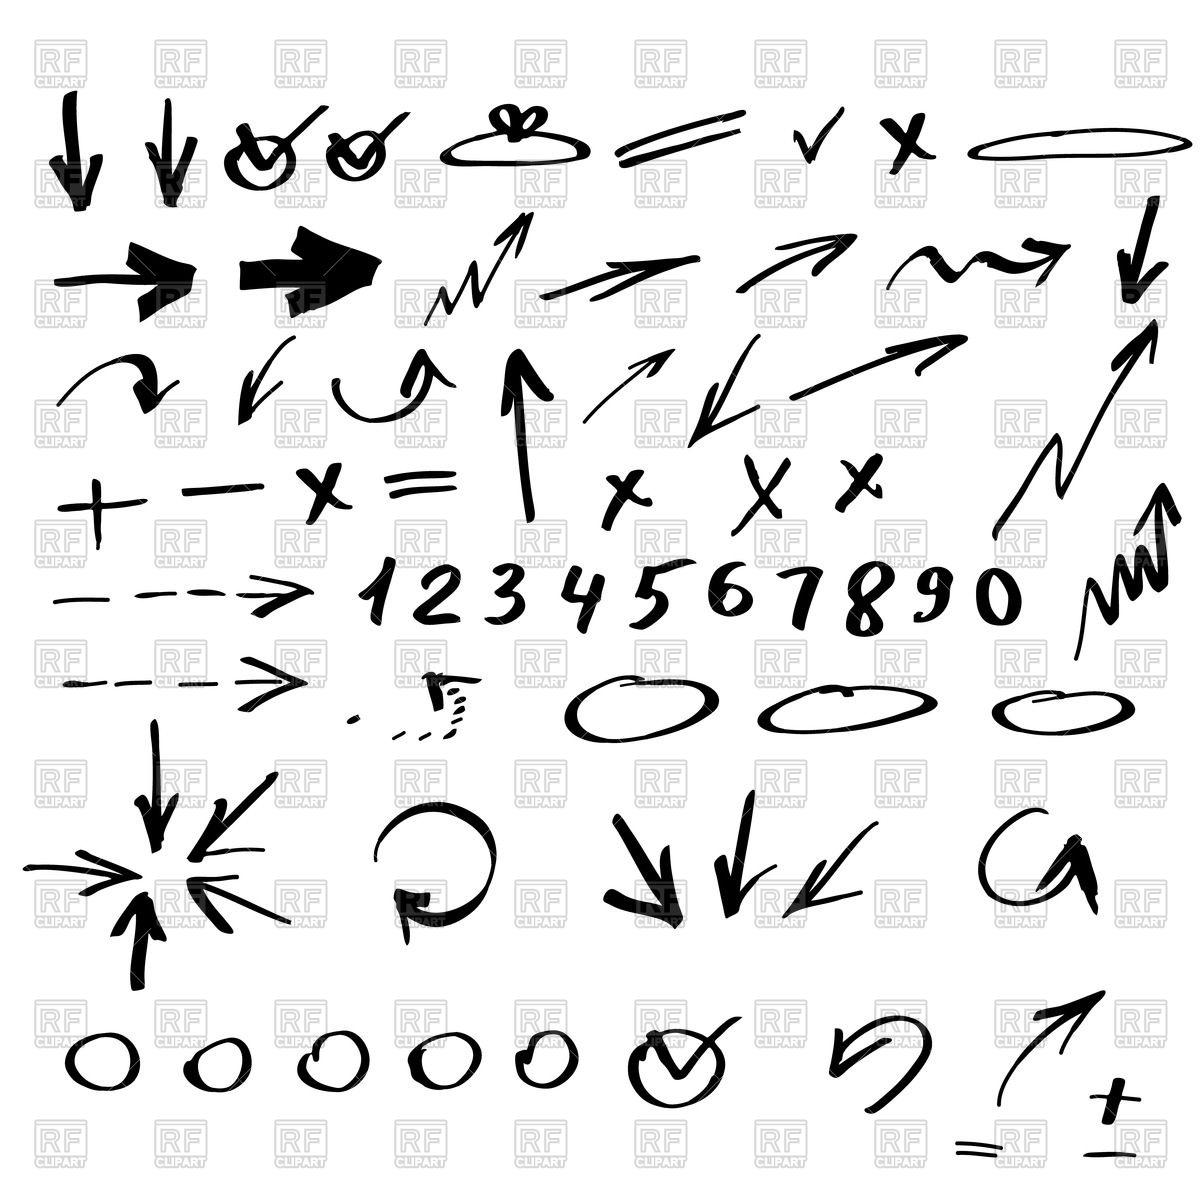 1200x1200 Handwritten Arrows, Signs, Symbols And Numerals Vector Image